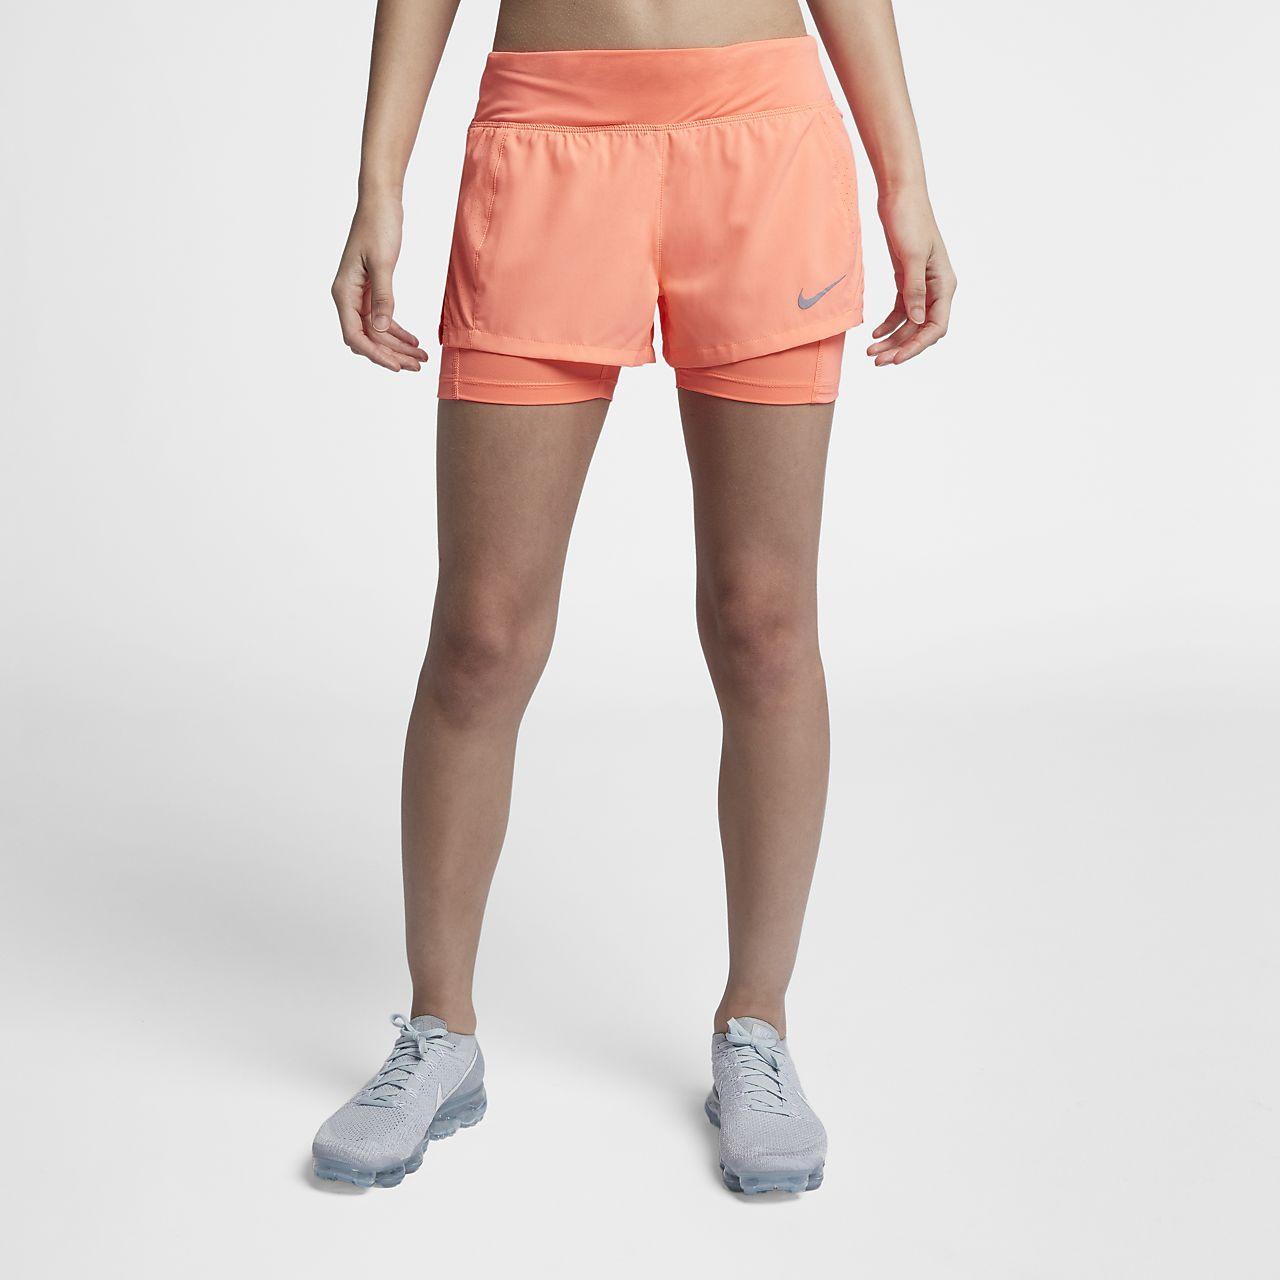 Discount Sale Nike Freedom - Sports Shorts - Light Photo Blue / Black / Silver Reflective Shop No.65